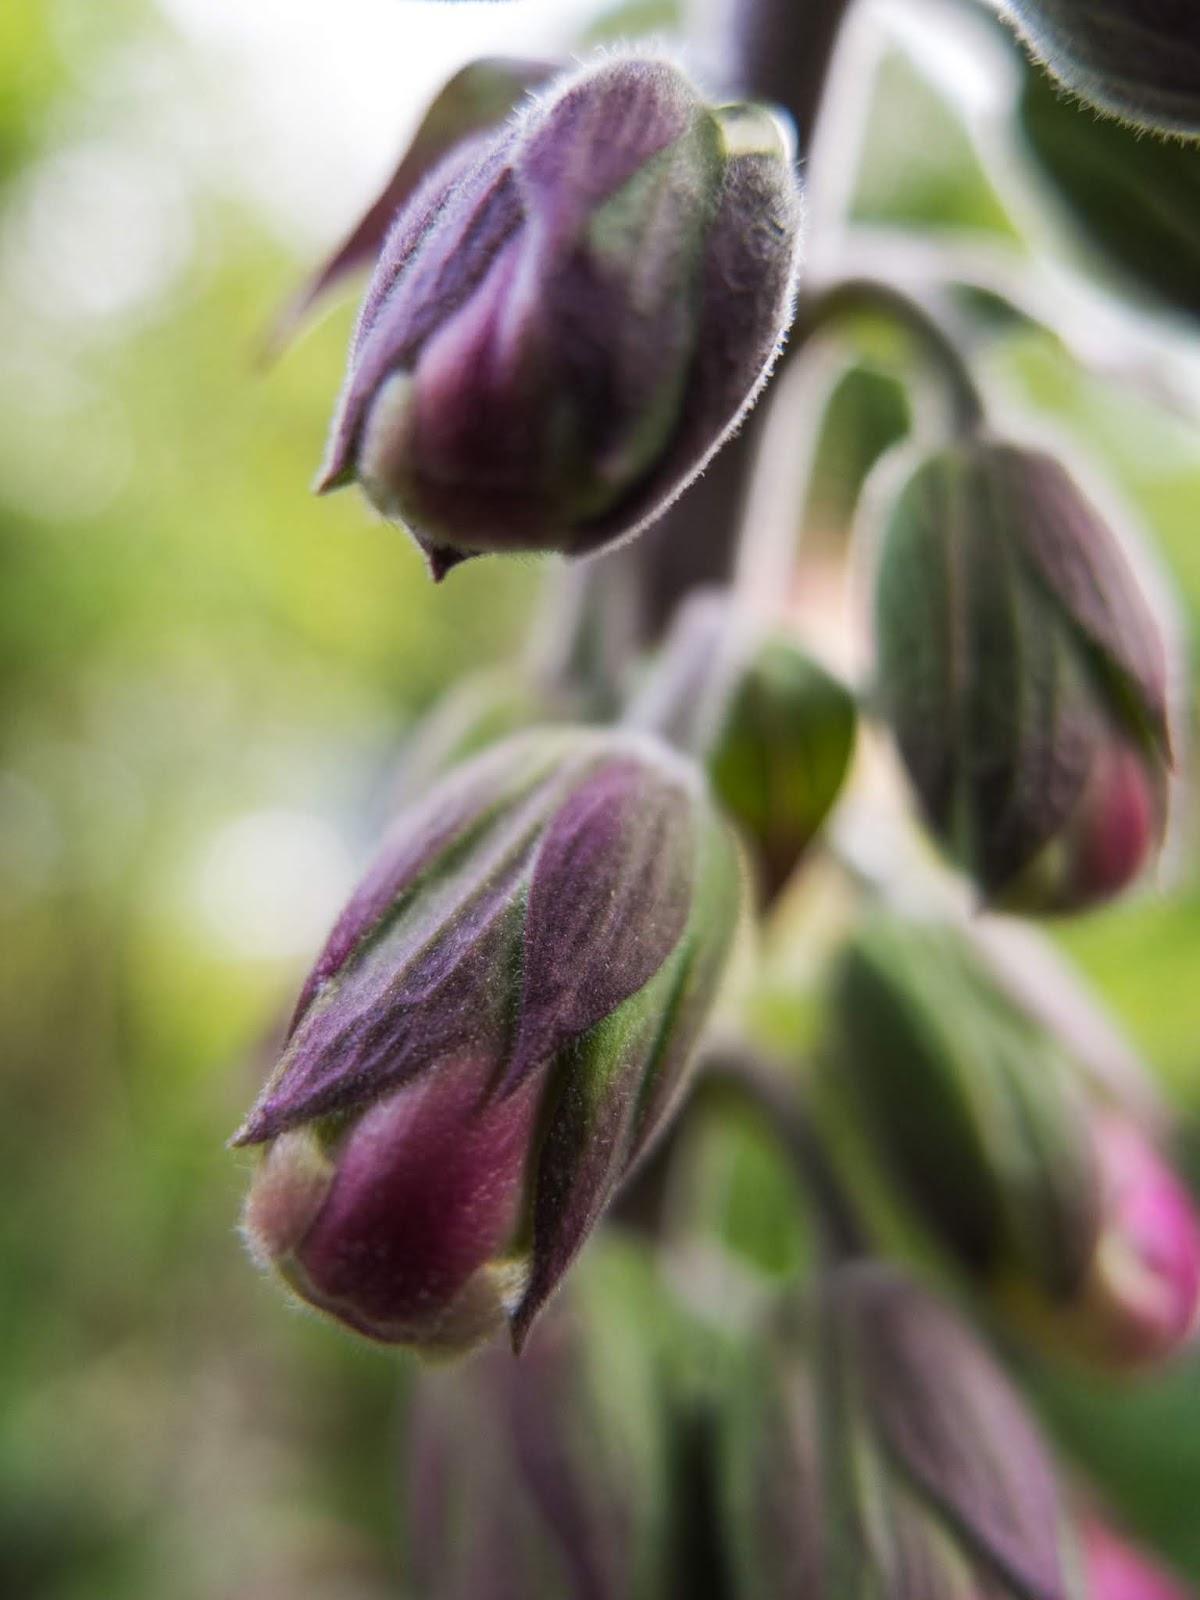 A macro of Foxglove flower buds on a stem.